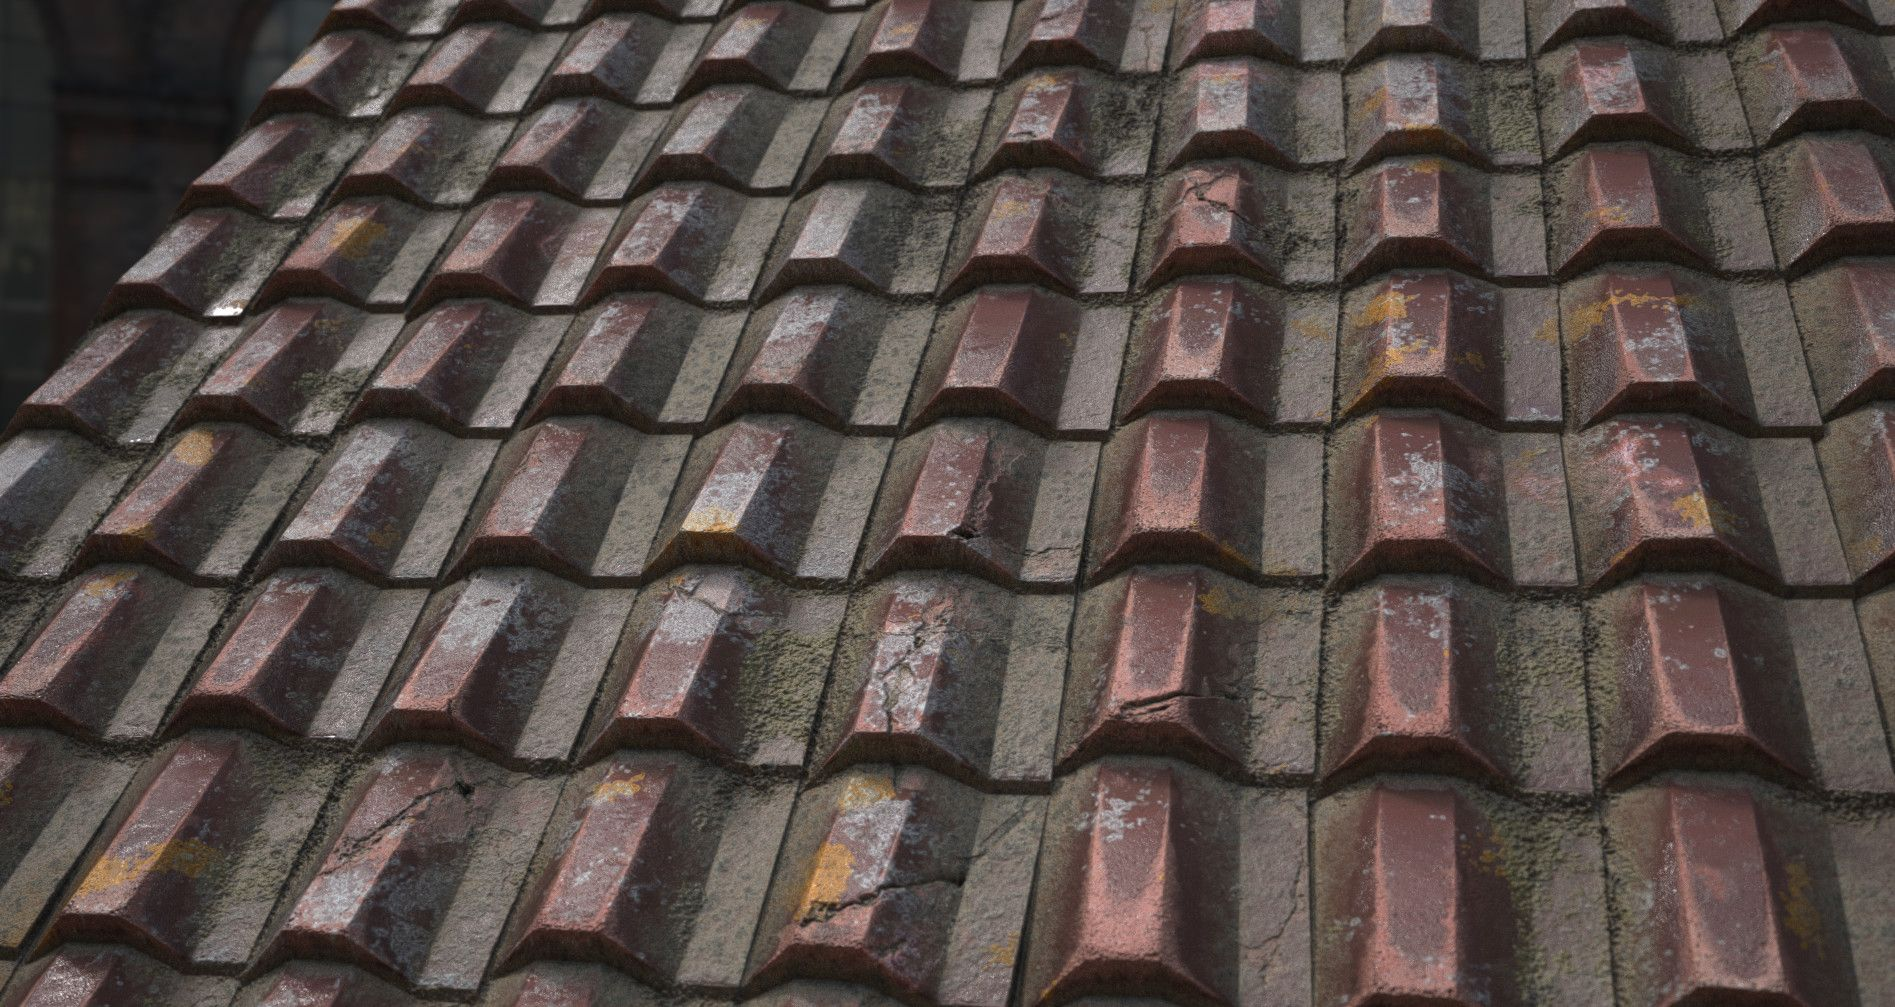 ArtStation - Ceramic Rooftiles - UPDATED, Käy Vriend